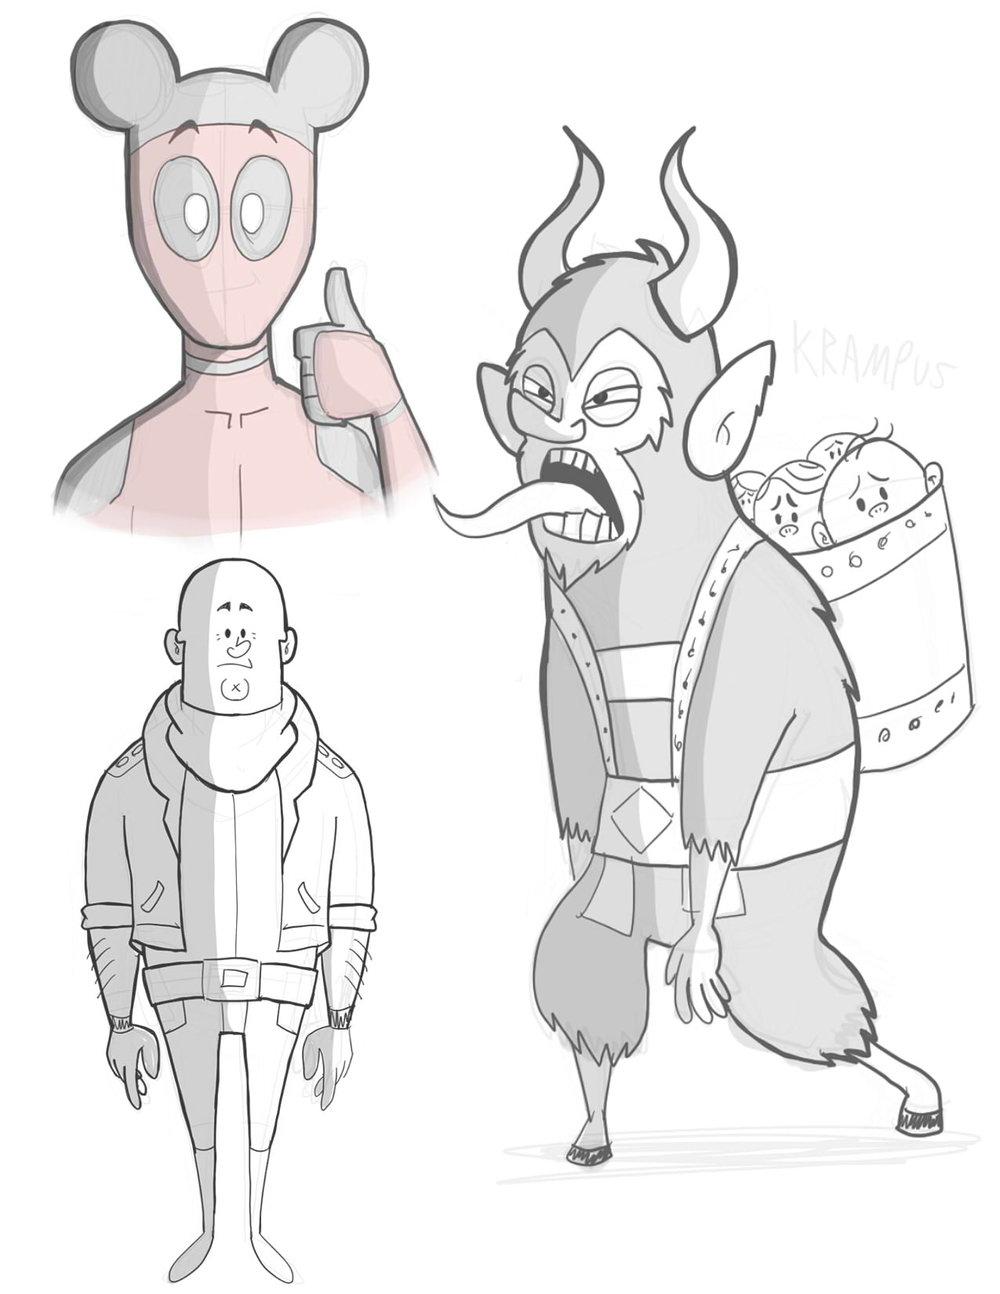 random sketches 177.jpg